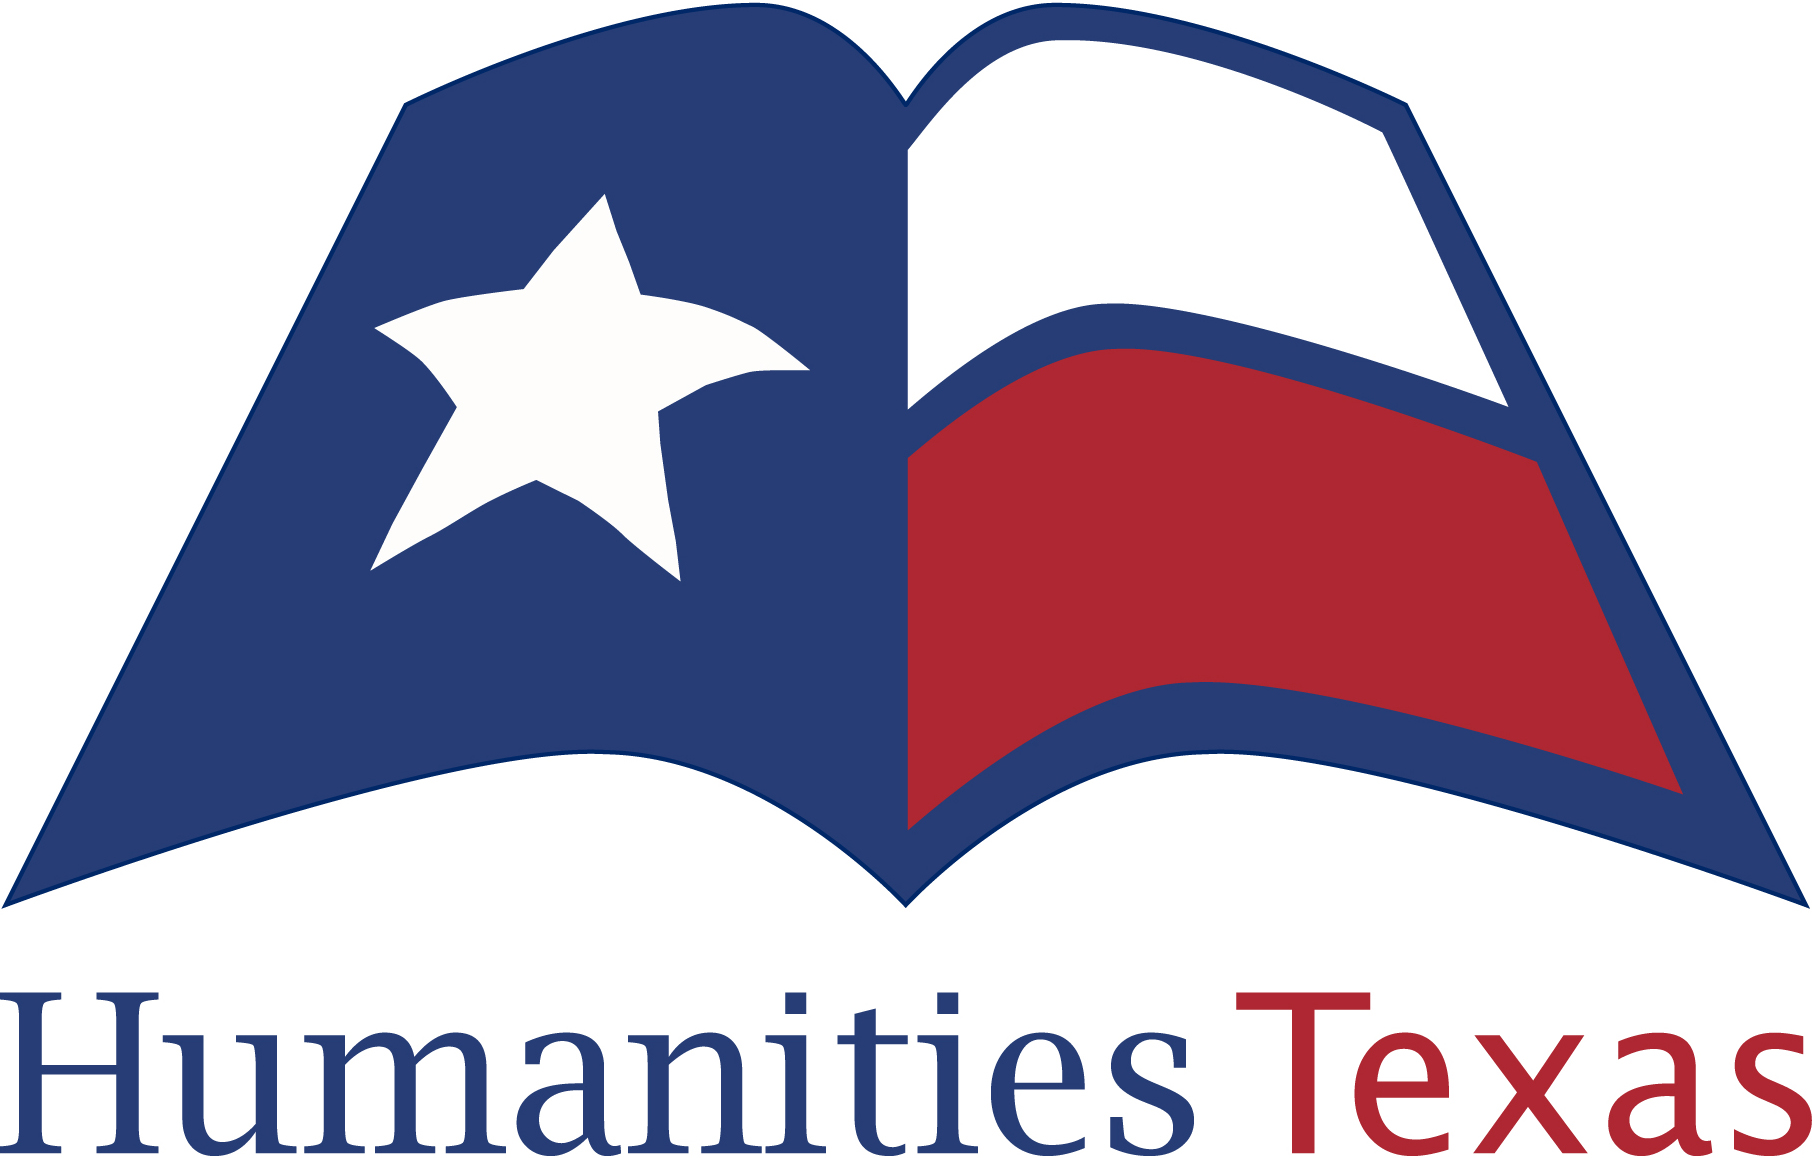 1812x1158 Texas Committee For Humanities (Humanities Texas)